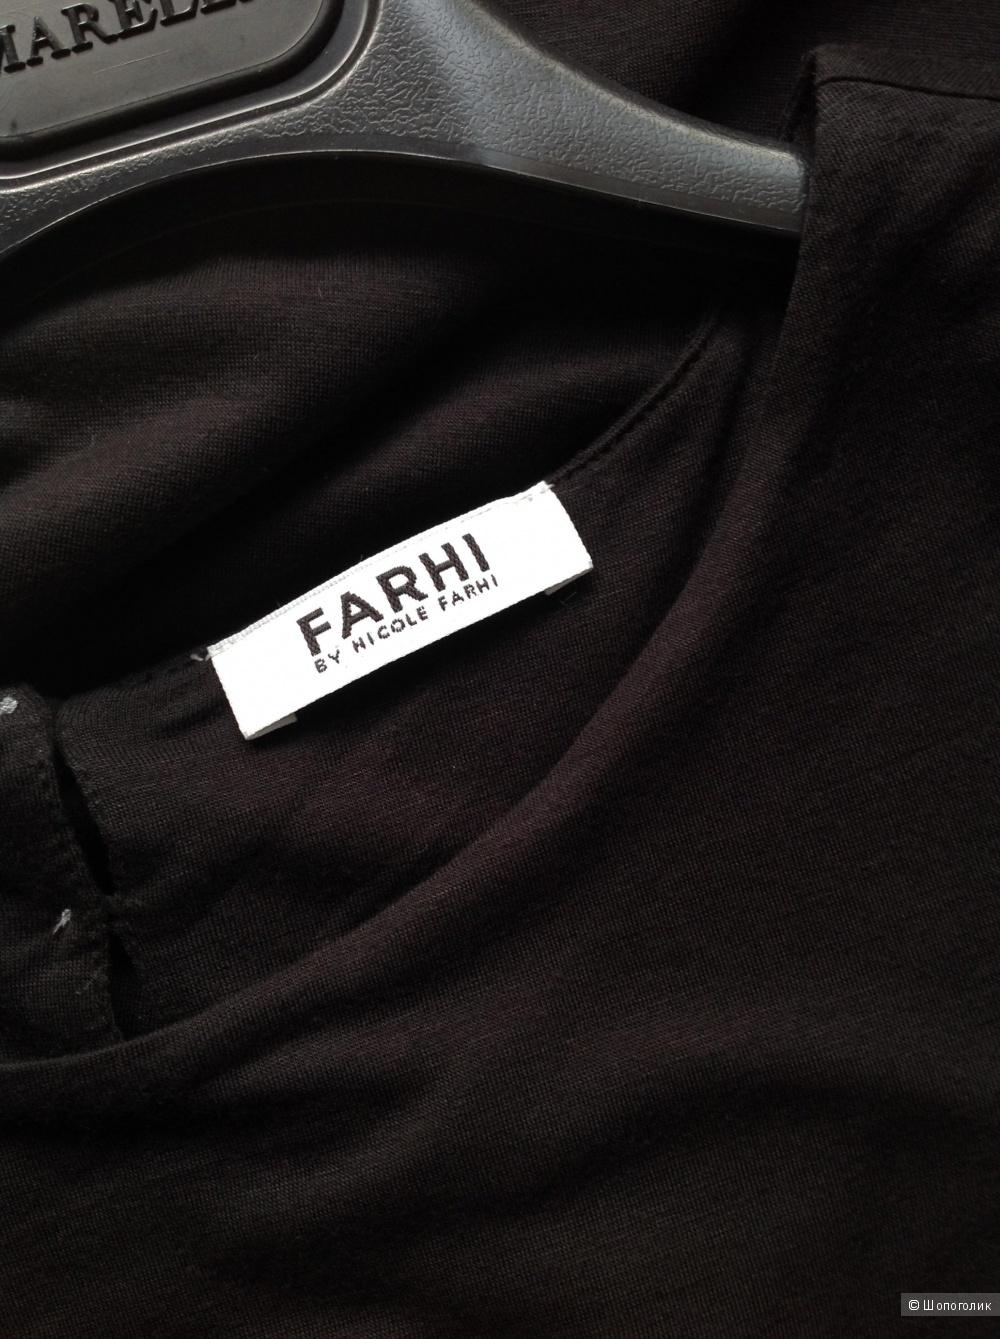 Платье Nicole Farhi, размер UK 8 на 42-44.